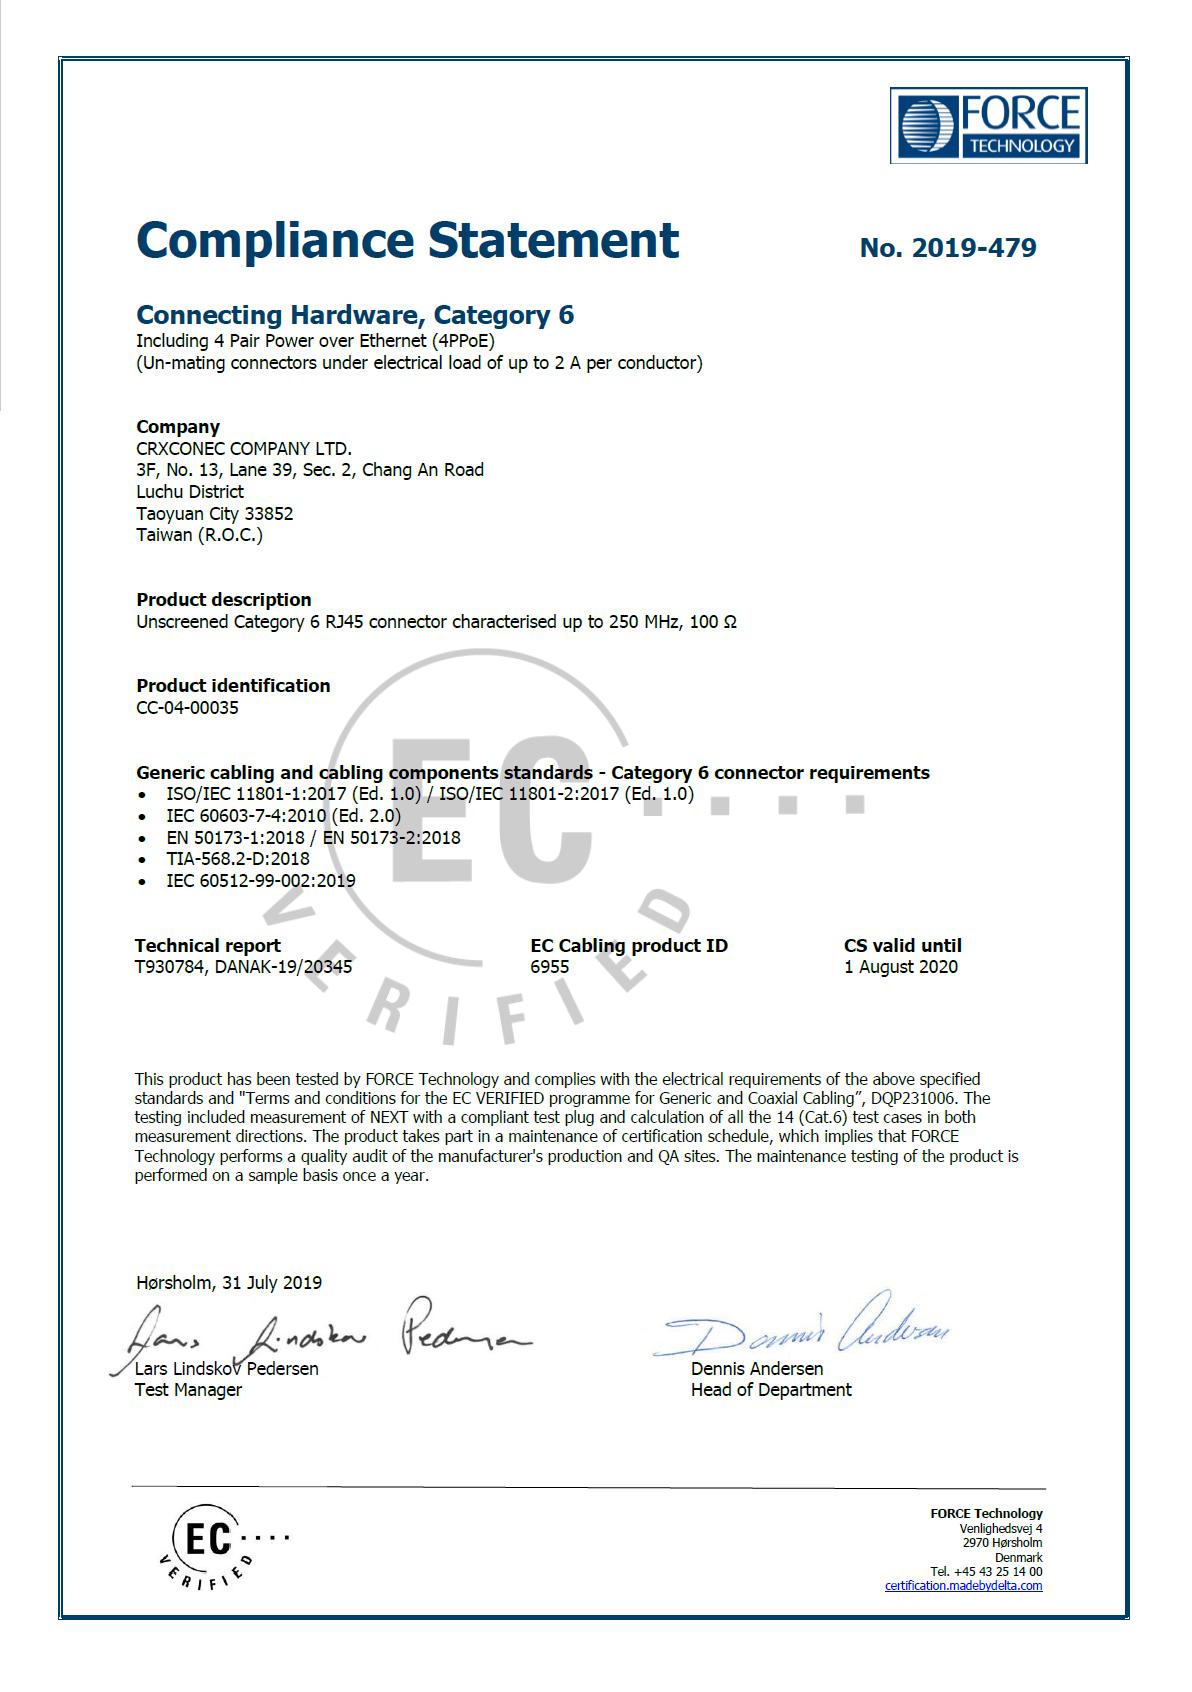 Delta Verified Cat.6 180 degree Keystone Jack Certification